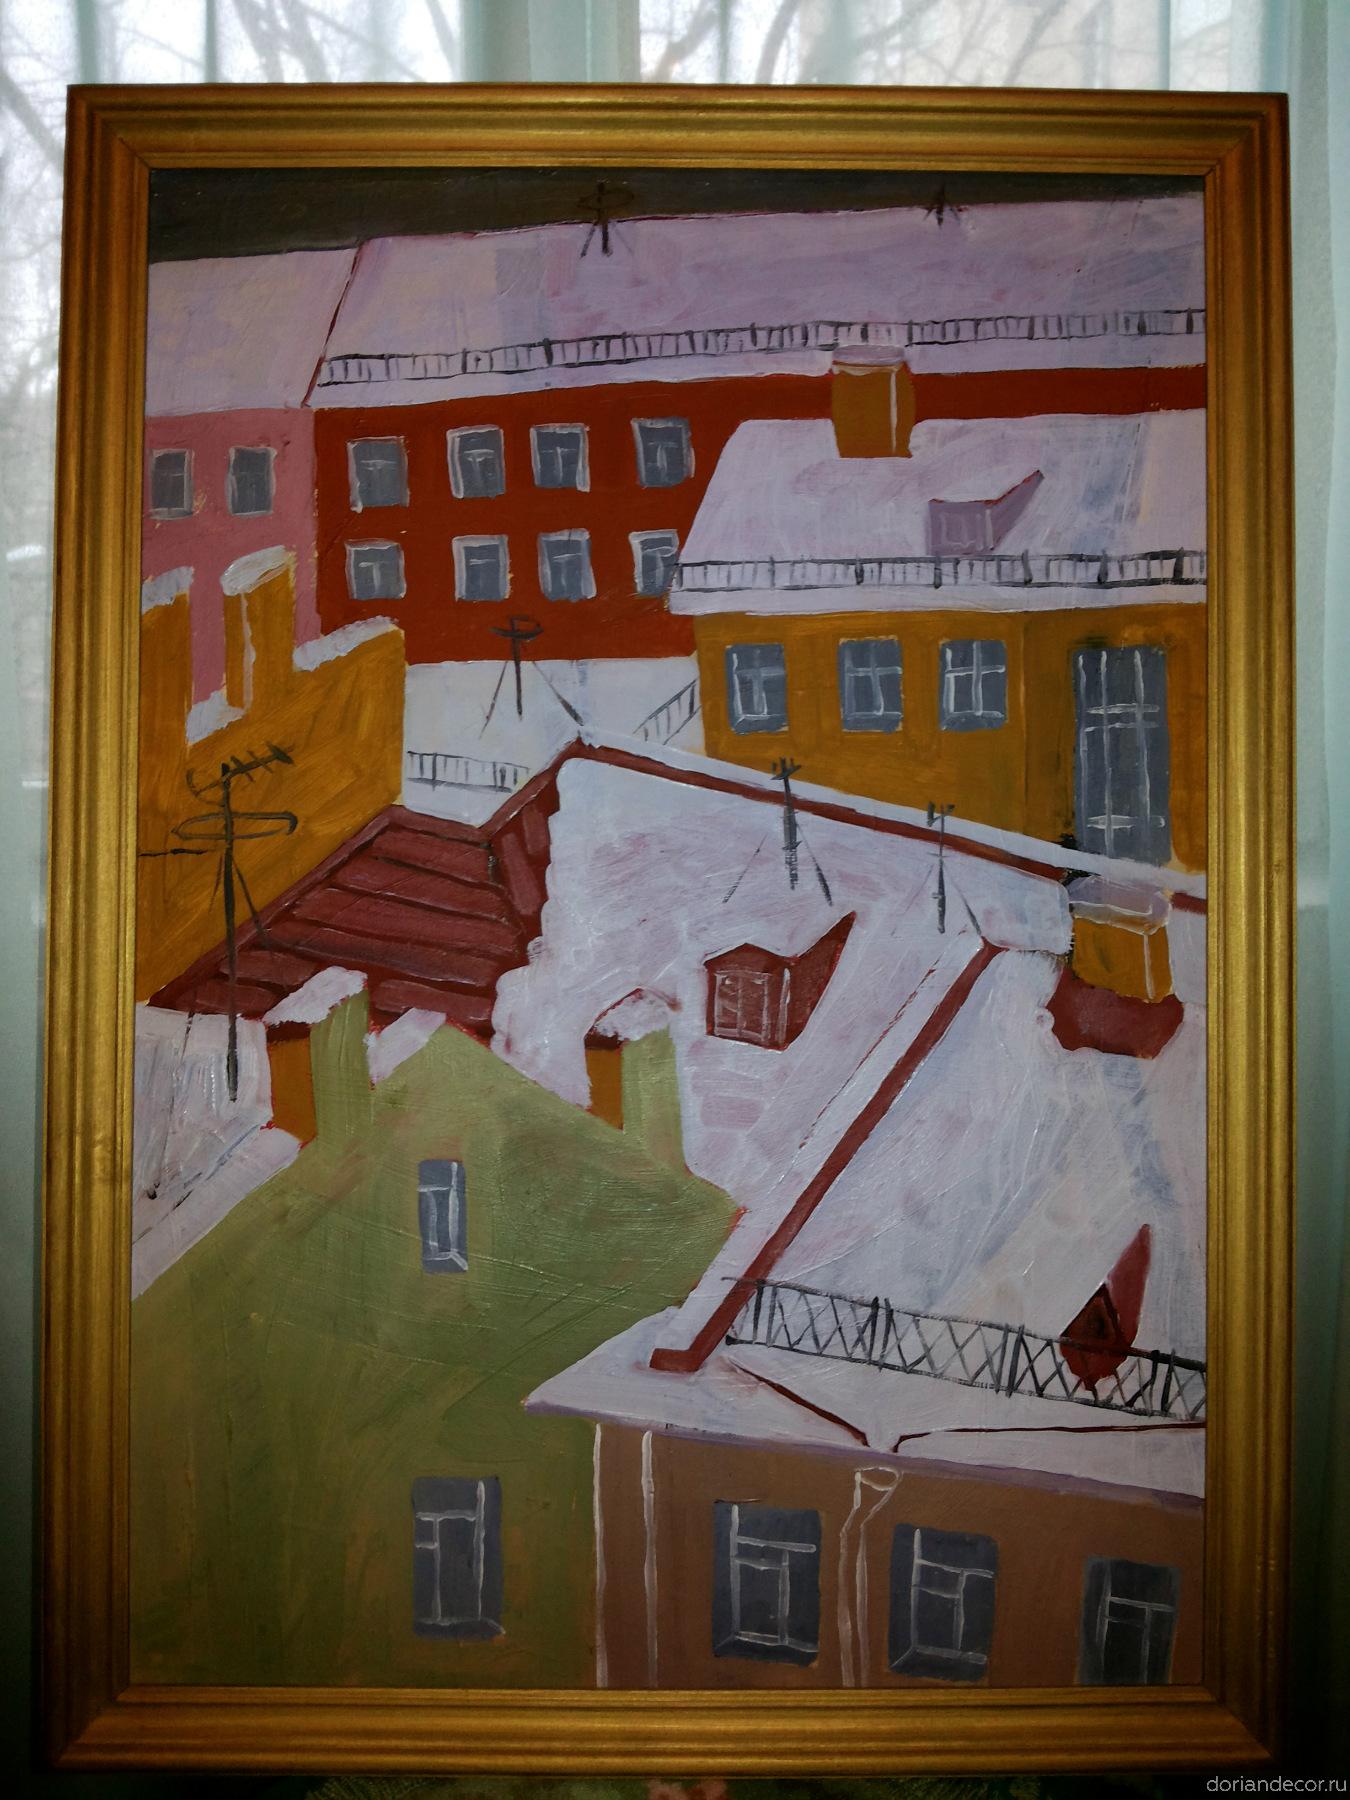 Вячеслав Агалаков — картина «Крыши» (1995 г.). 50 х 71 см.